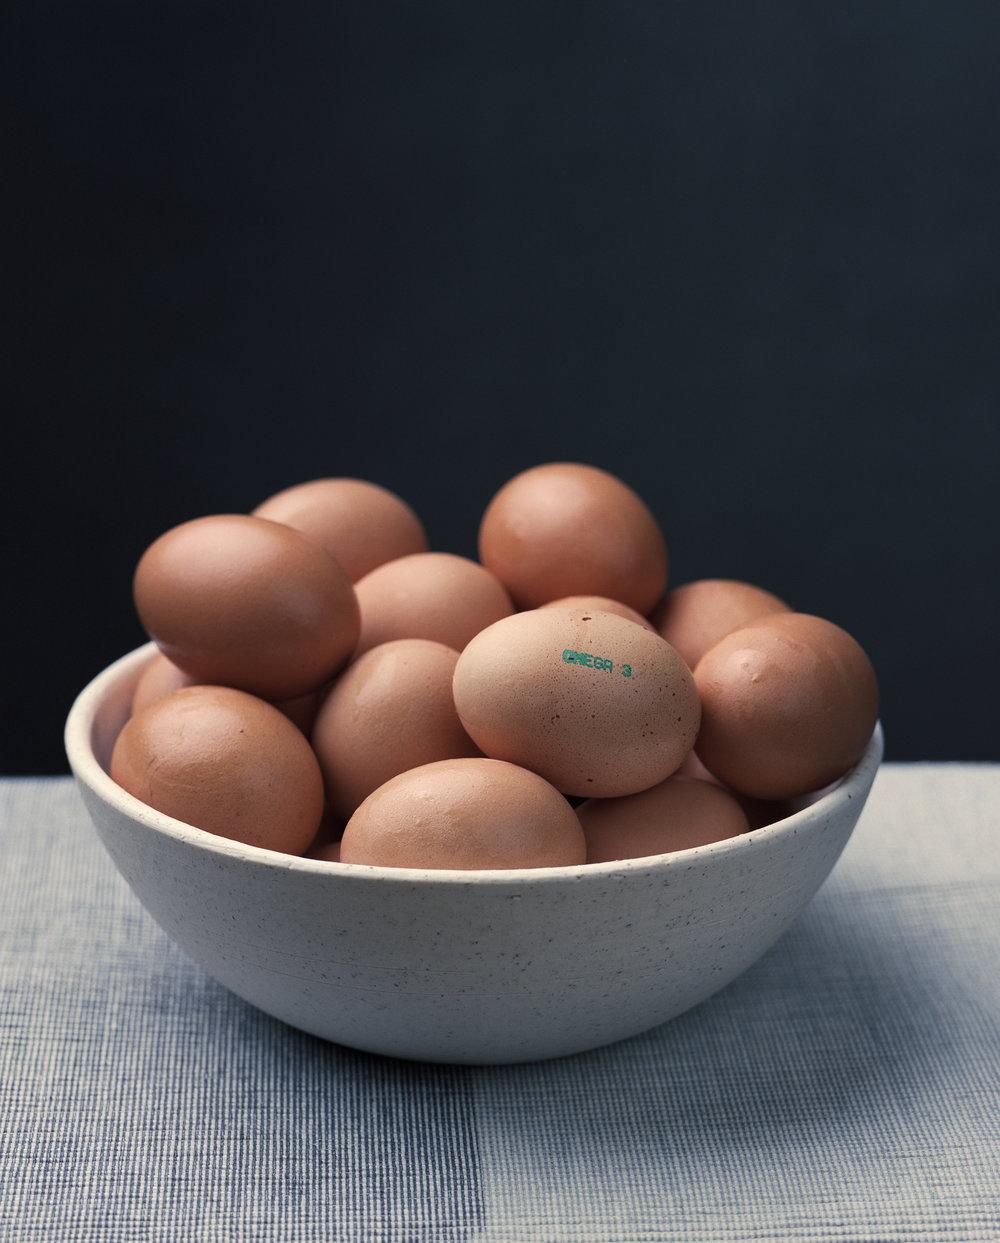 Free Range Omega 3 Eggs